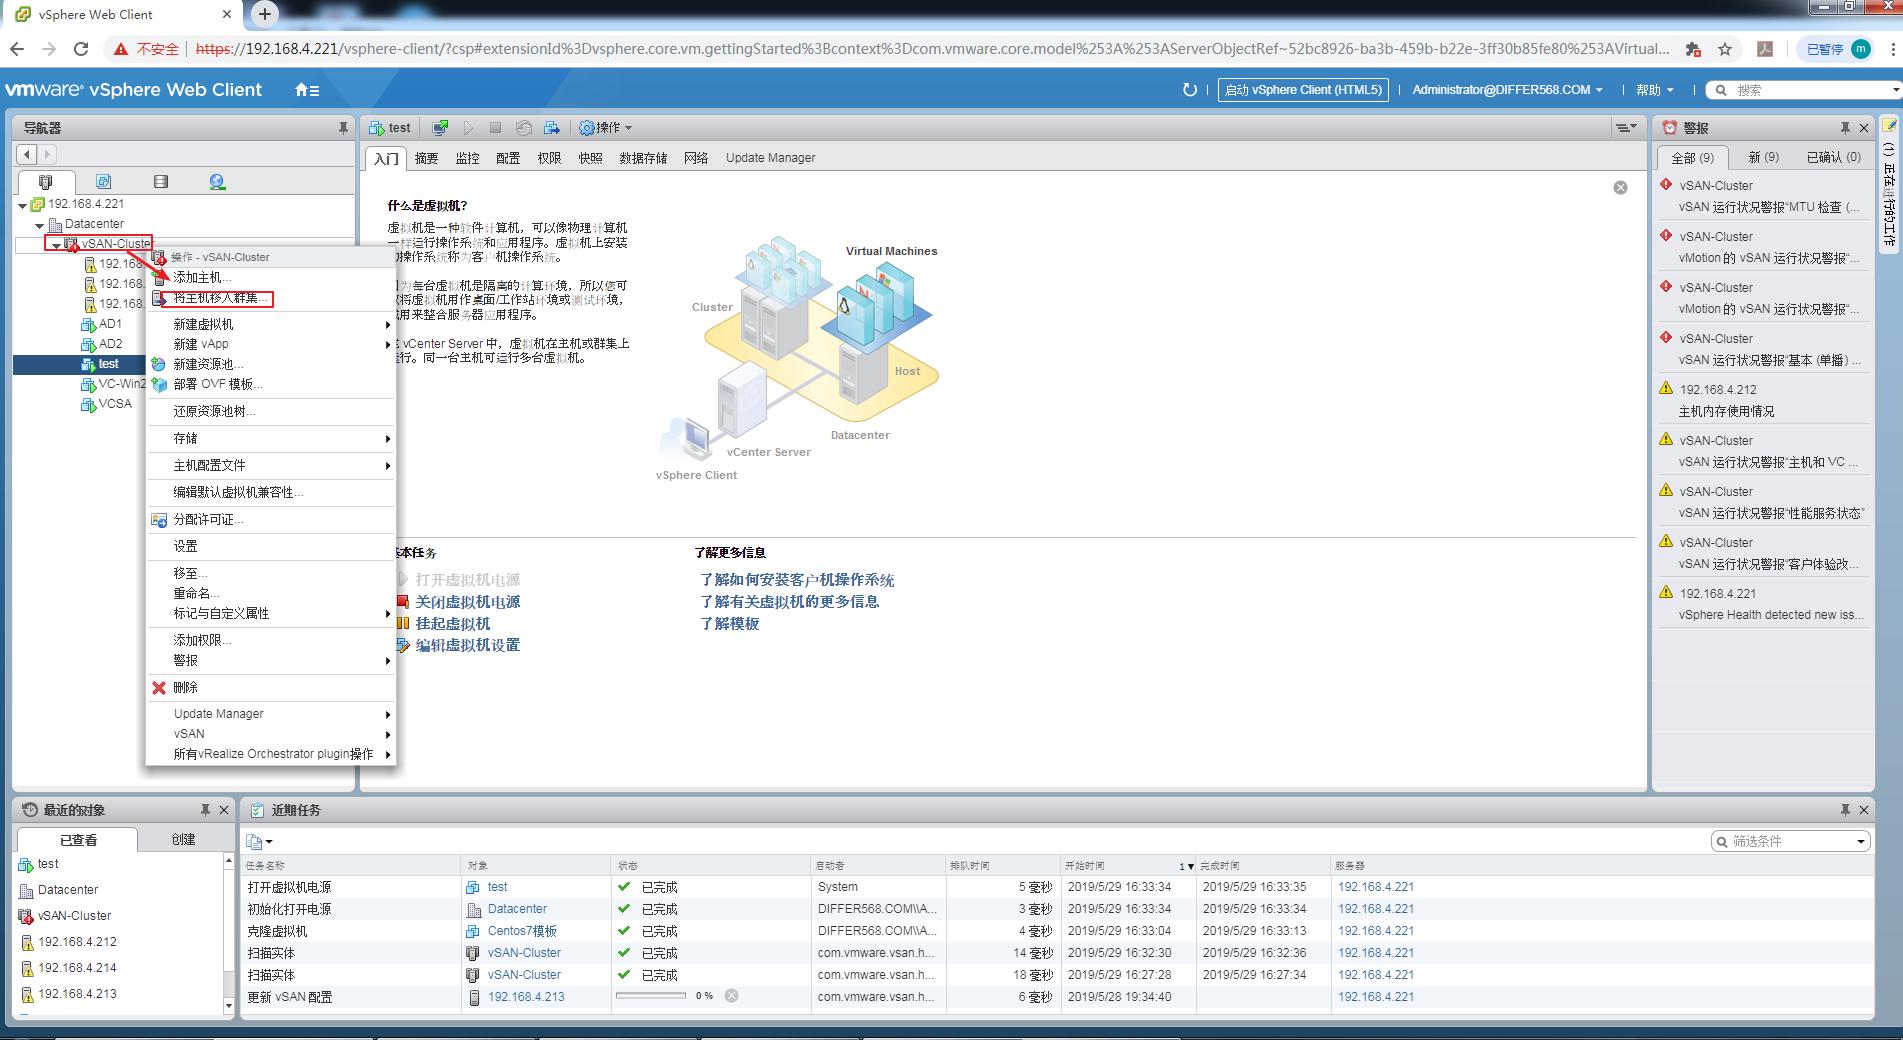 "vSphere Web Client 添加主机进VSAN集群时""SAN 主机移至目标群集: vSAN 群集的 UUID 不匹配""报错"